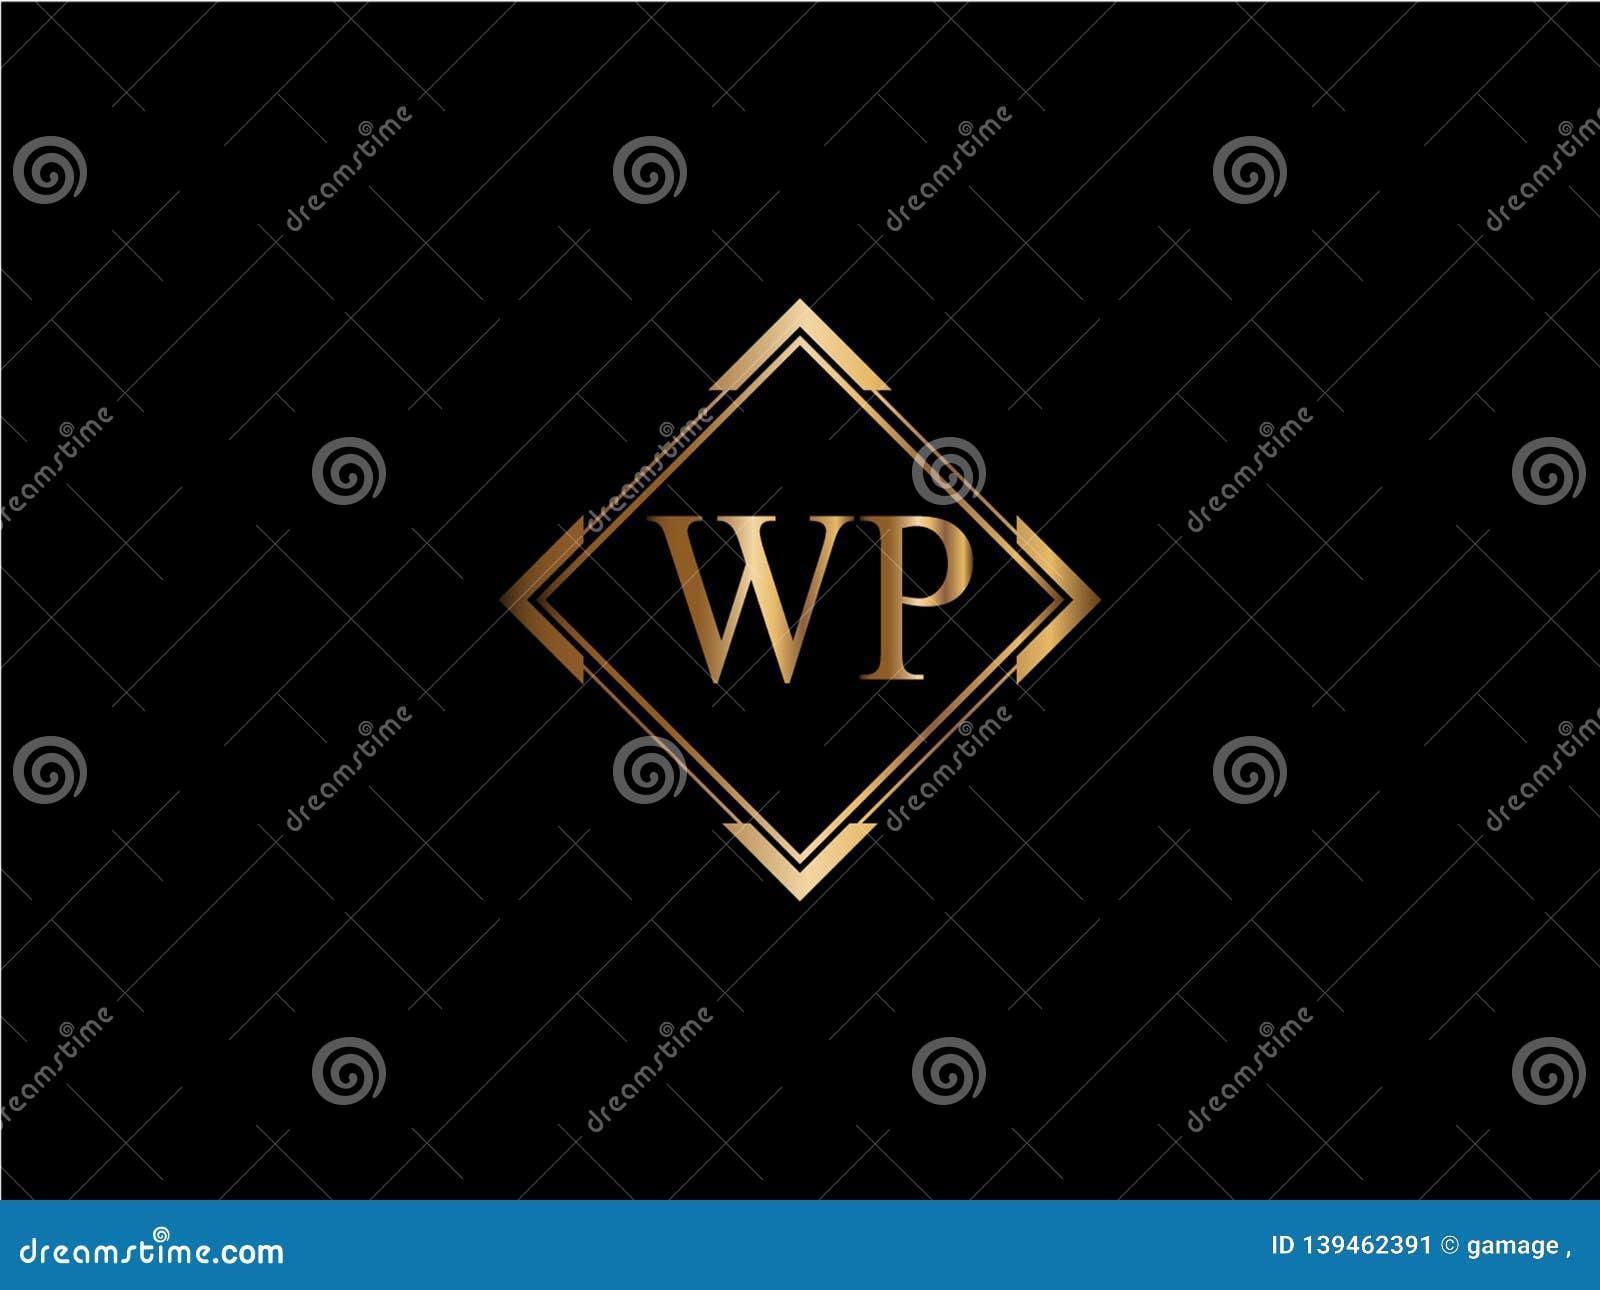 Wp-Anfangsdiamantform Goldfarbe neuerer Logo Design